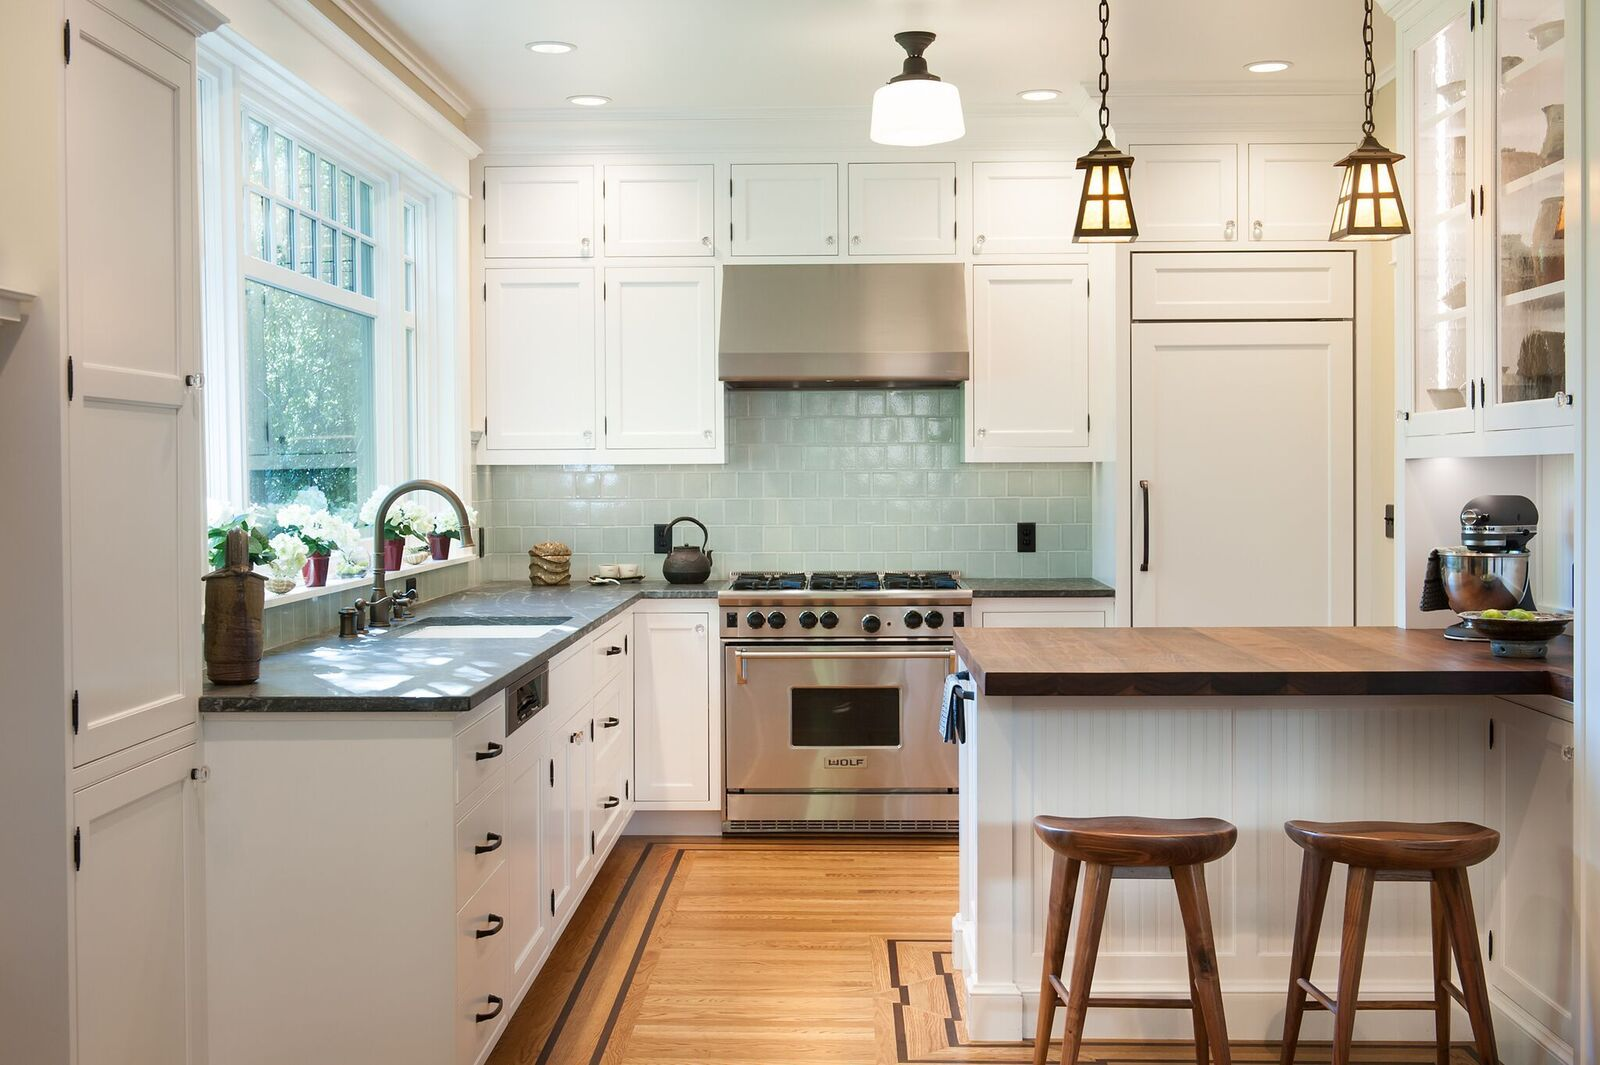 Salton Sea Offset Squares Against White Cabinets Stunning Craftsman Kitchen White Kitchen Inspiration Design White Kitchen Inspiration